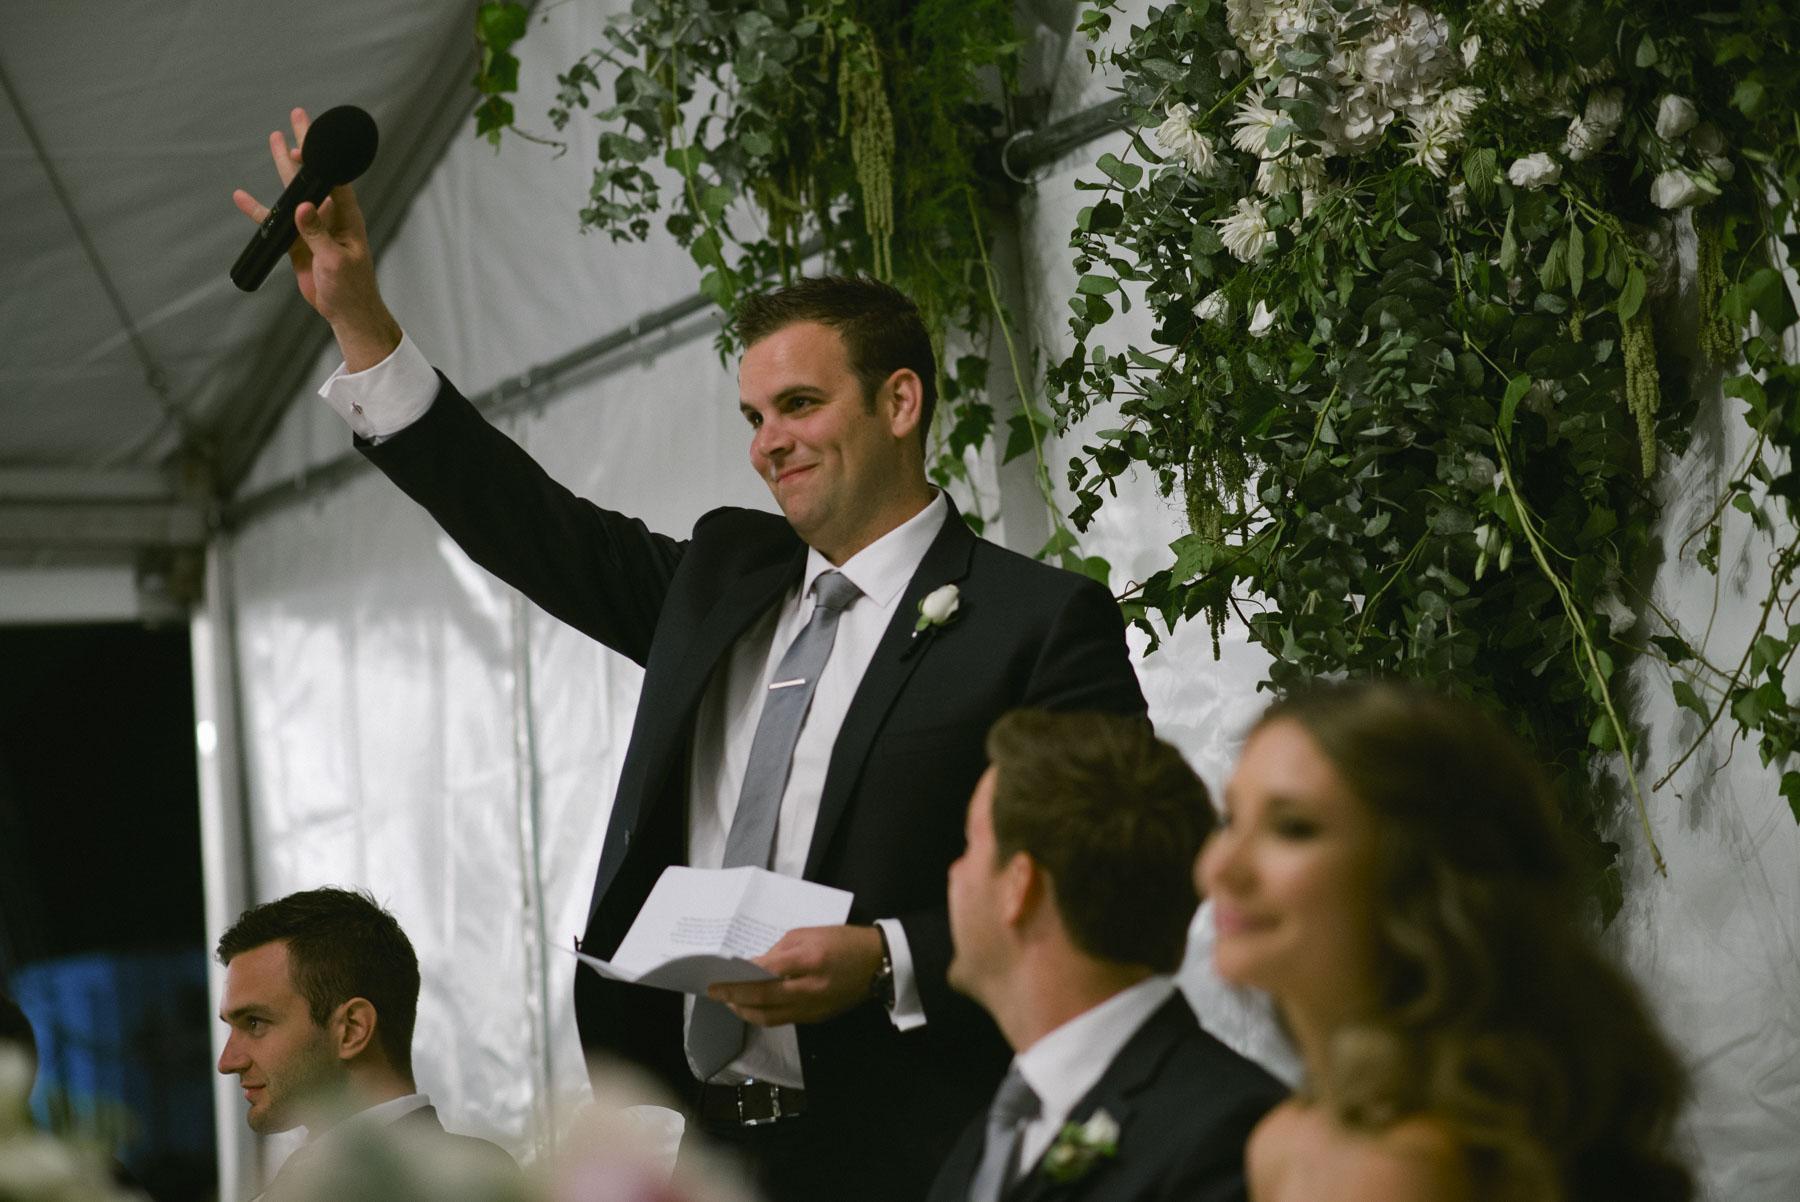 1501vand-421alan_moyle_wedding_portrait_brighton_bayside_werribee_estate_mansion_zoo_rustic_styled_garden_mansion_candid_documentry_victoria_whitelaw.jpg